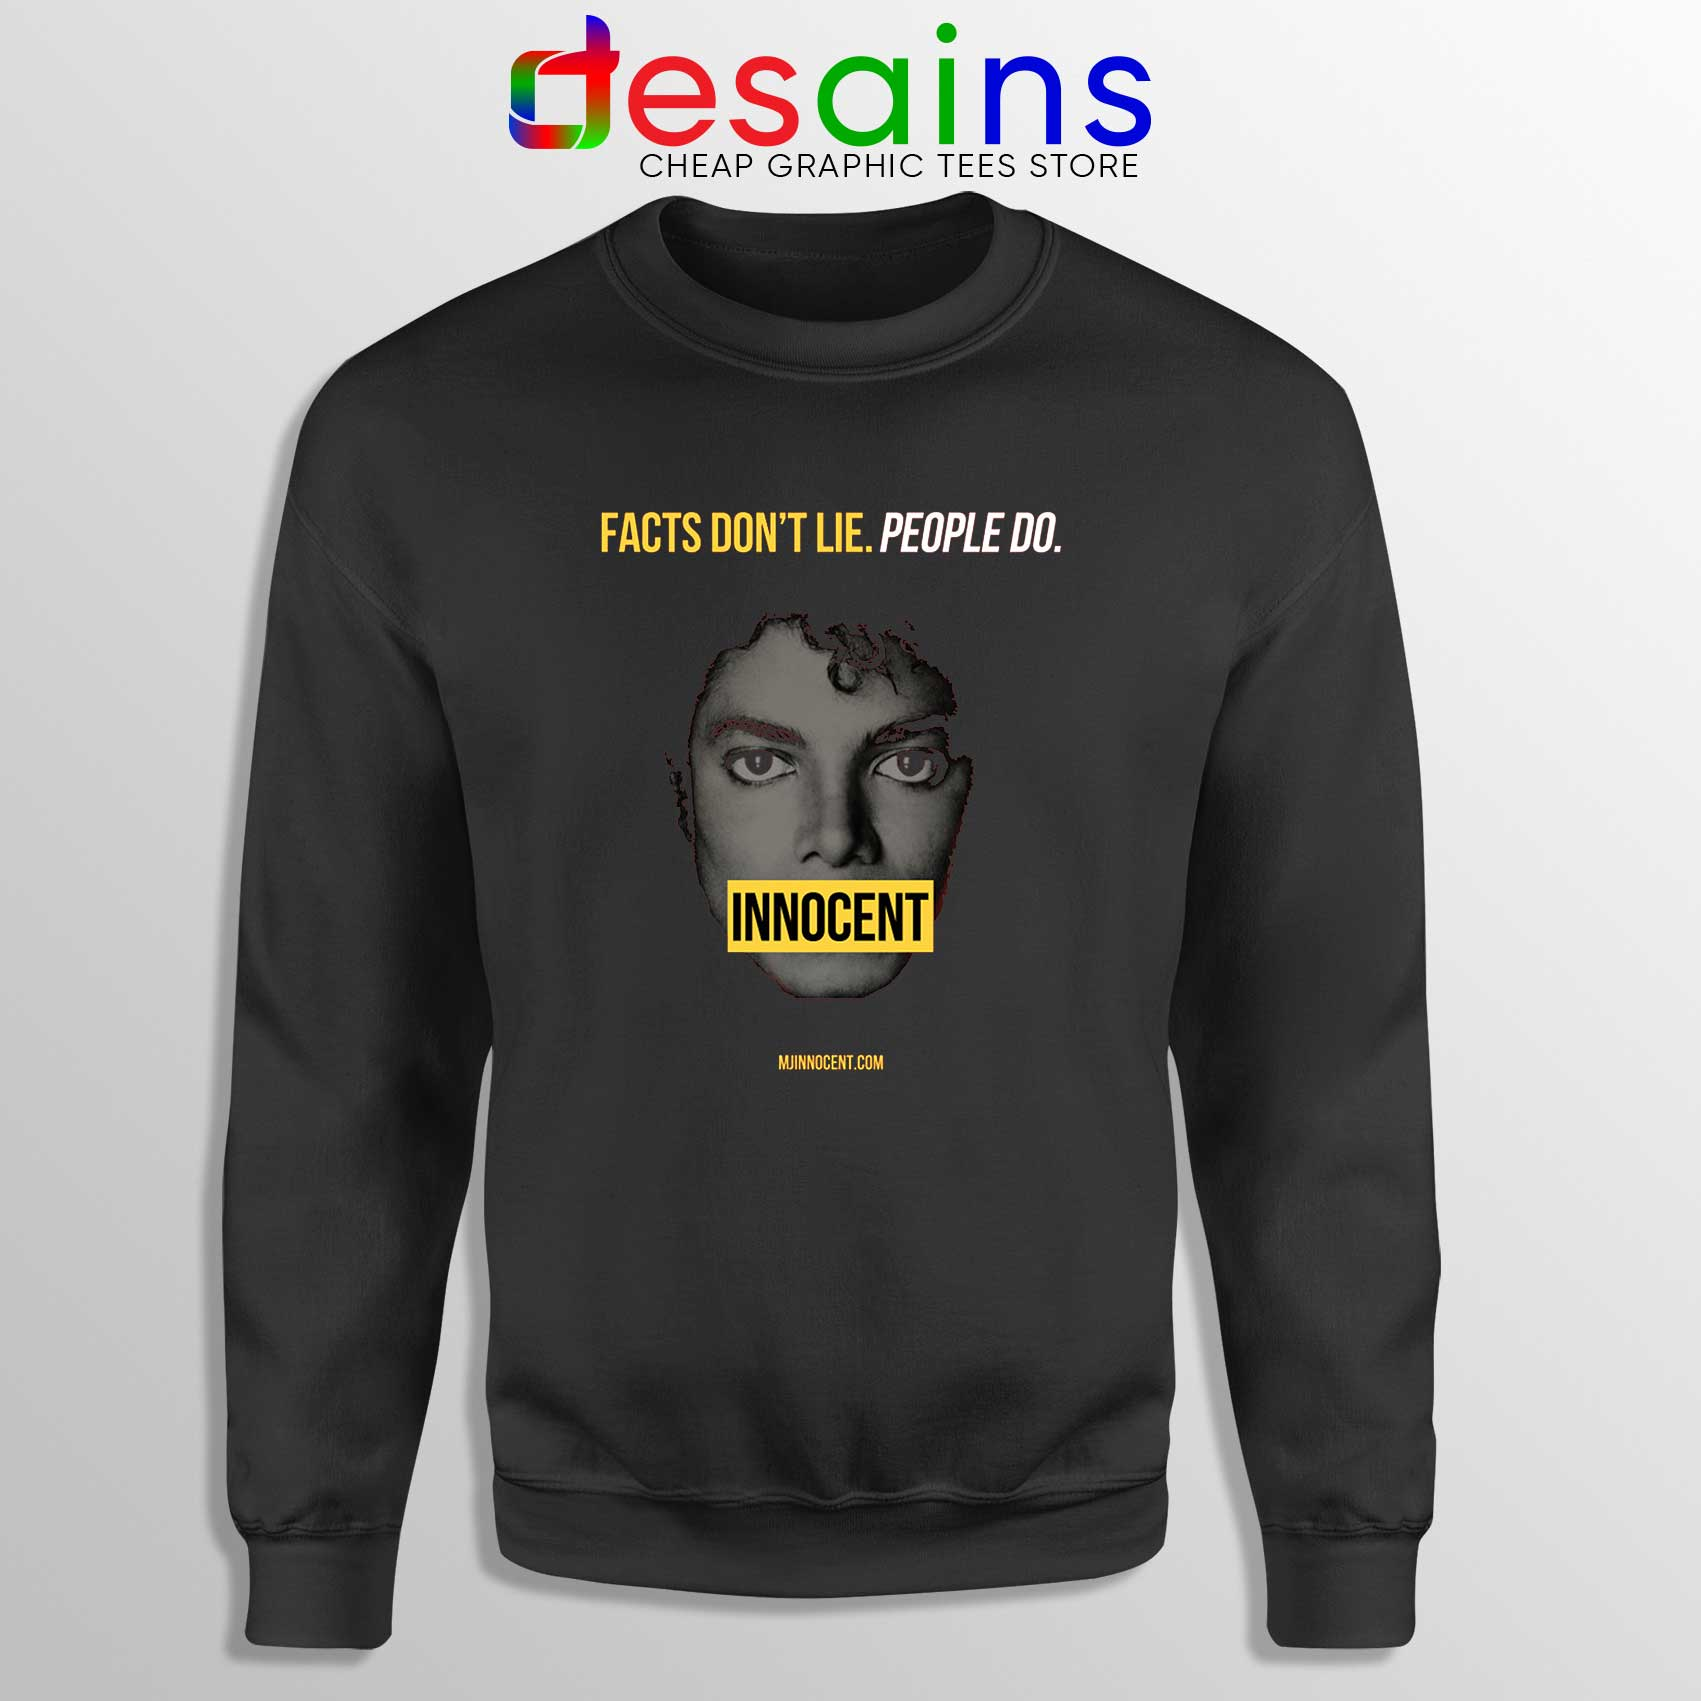 407d357a Sweatshirt-Michael-Jackson-Innocent-Facts-Don't-Lie-People-Do.jpg